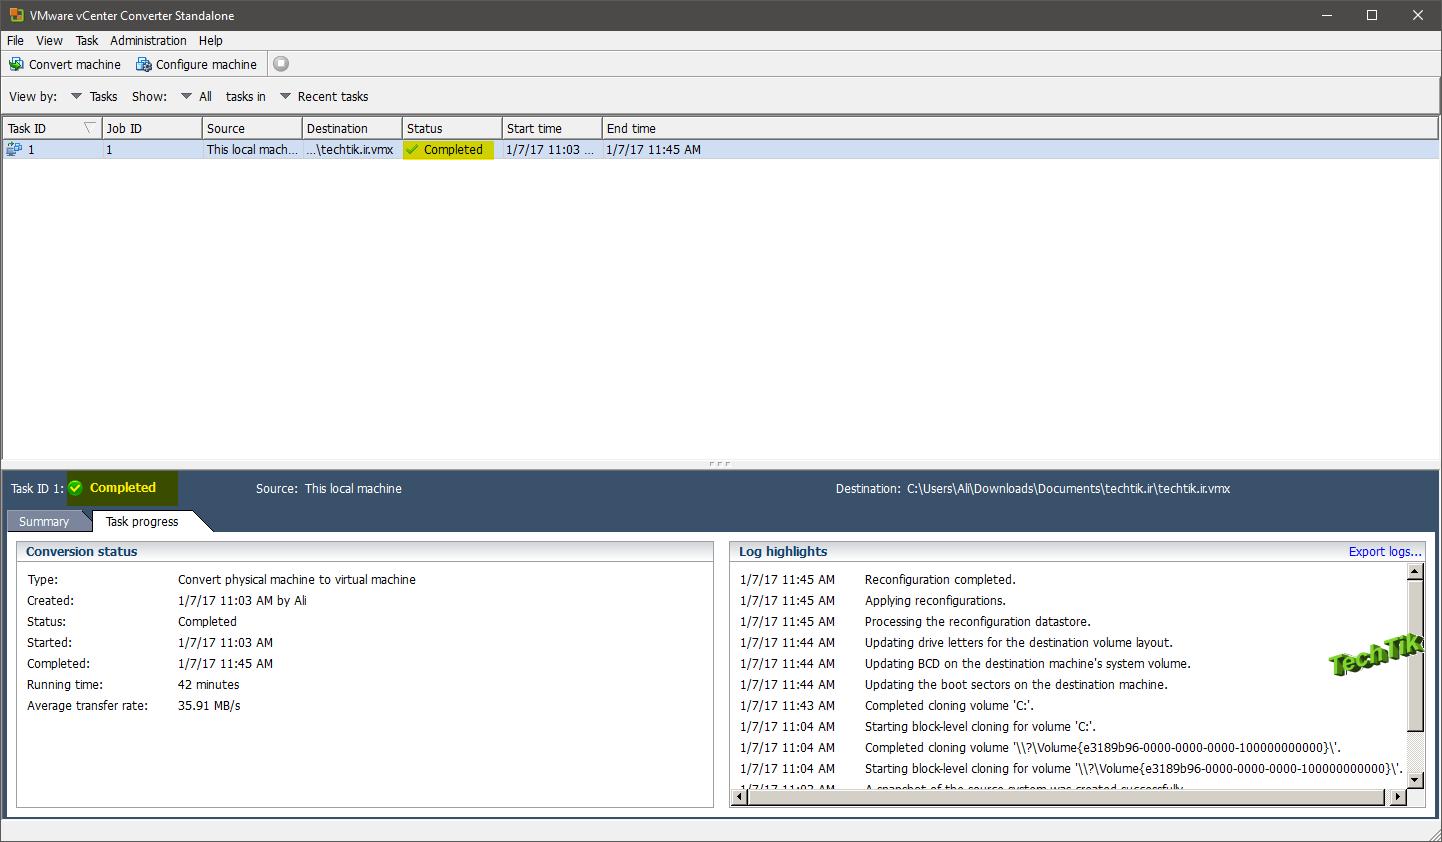 vmware-vcenter-converter-standalone-client-13